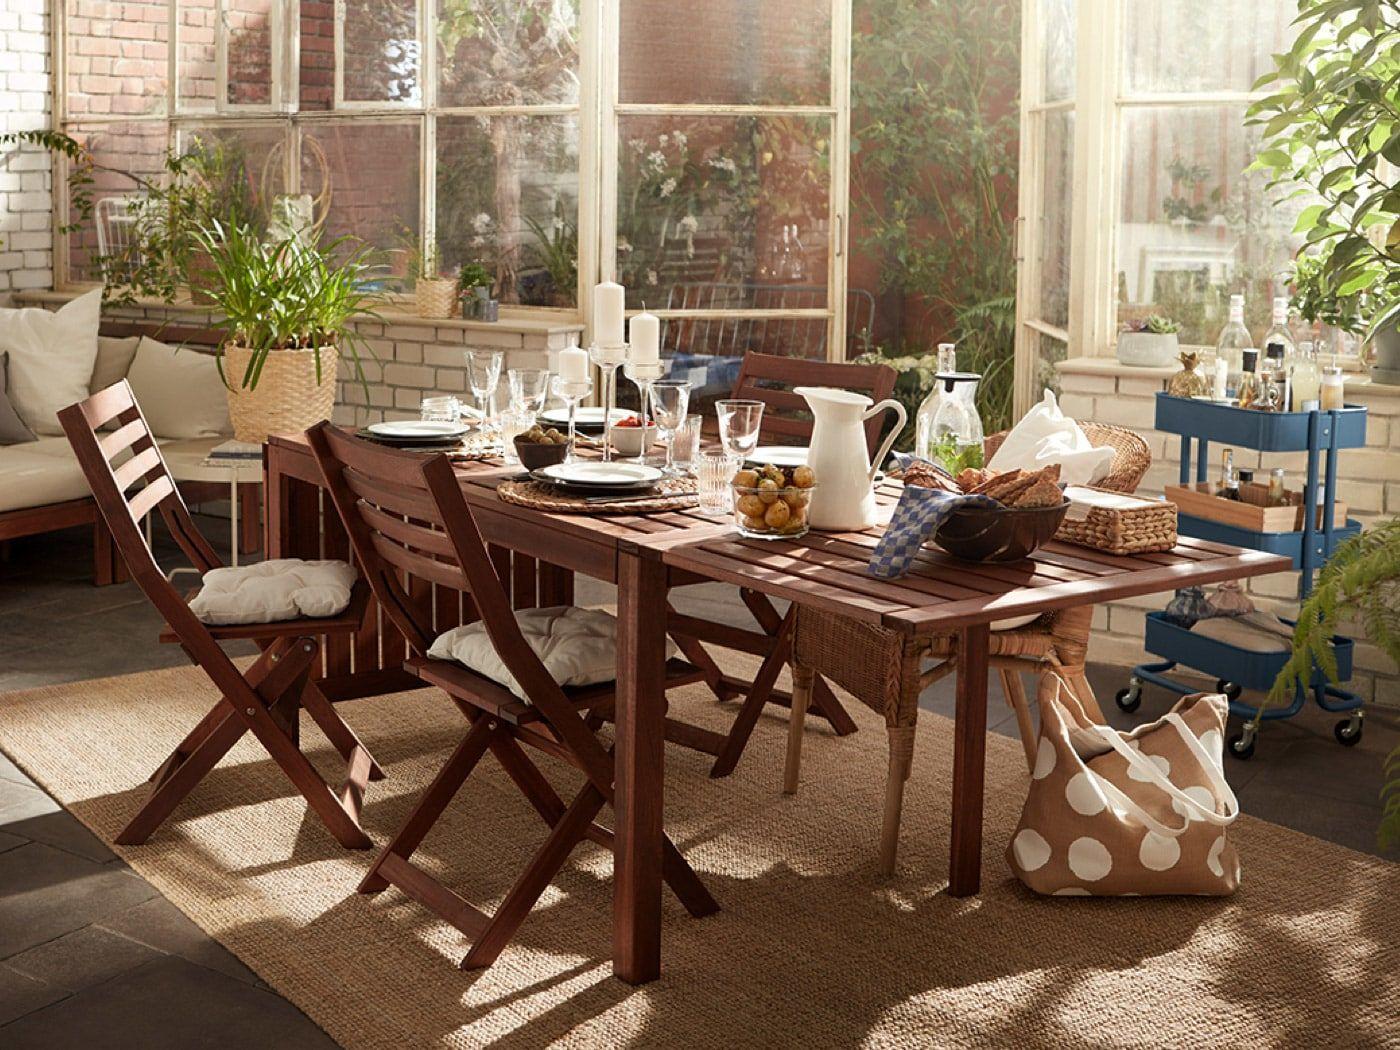 Balkonmobel Ikea Holz